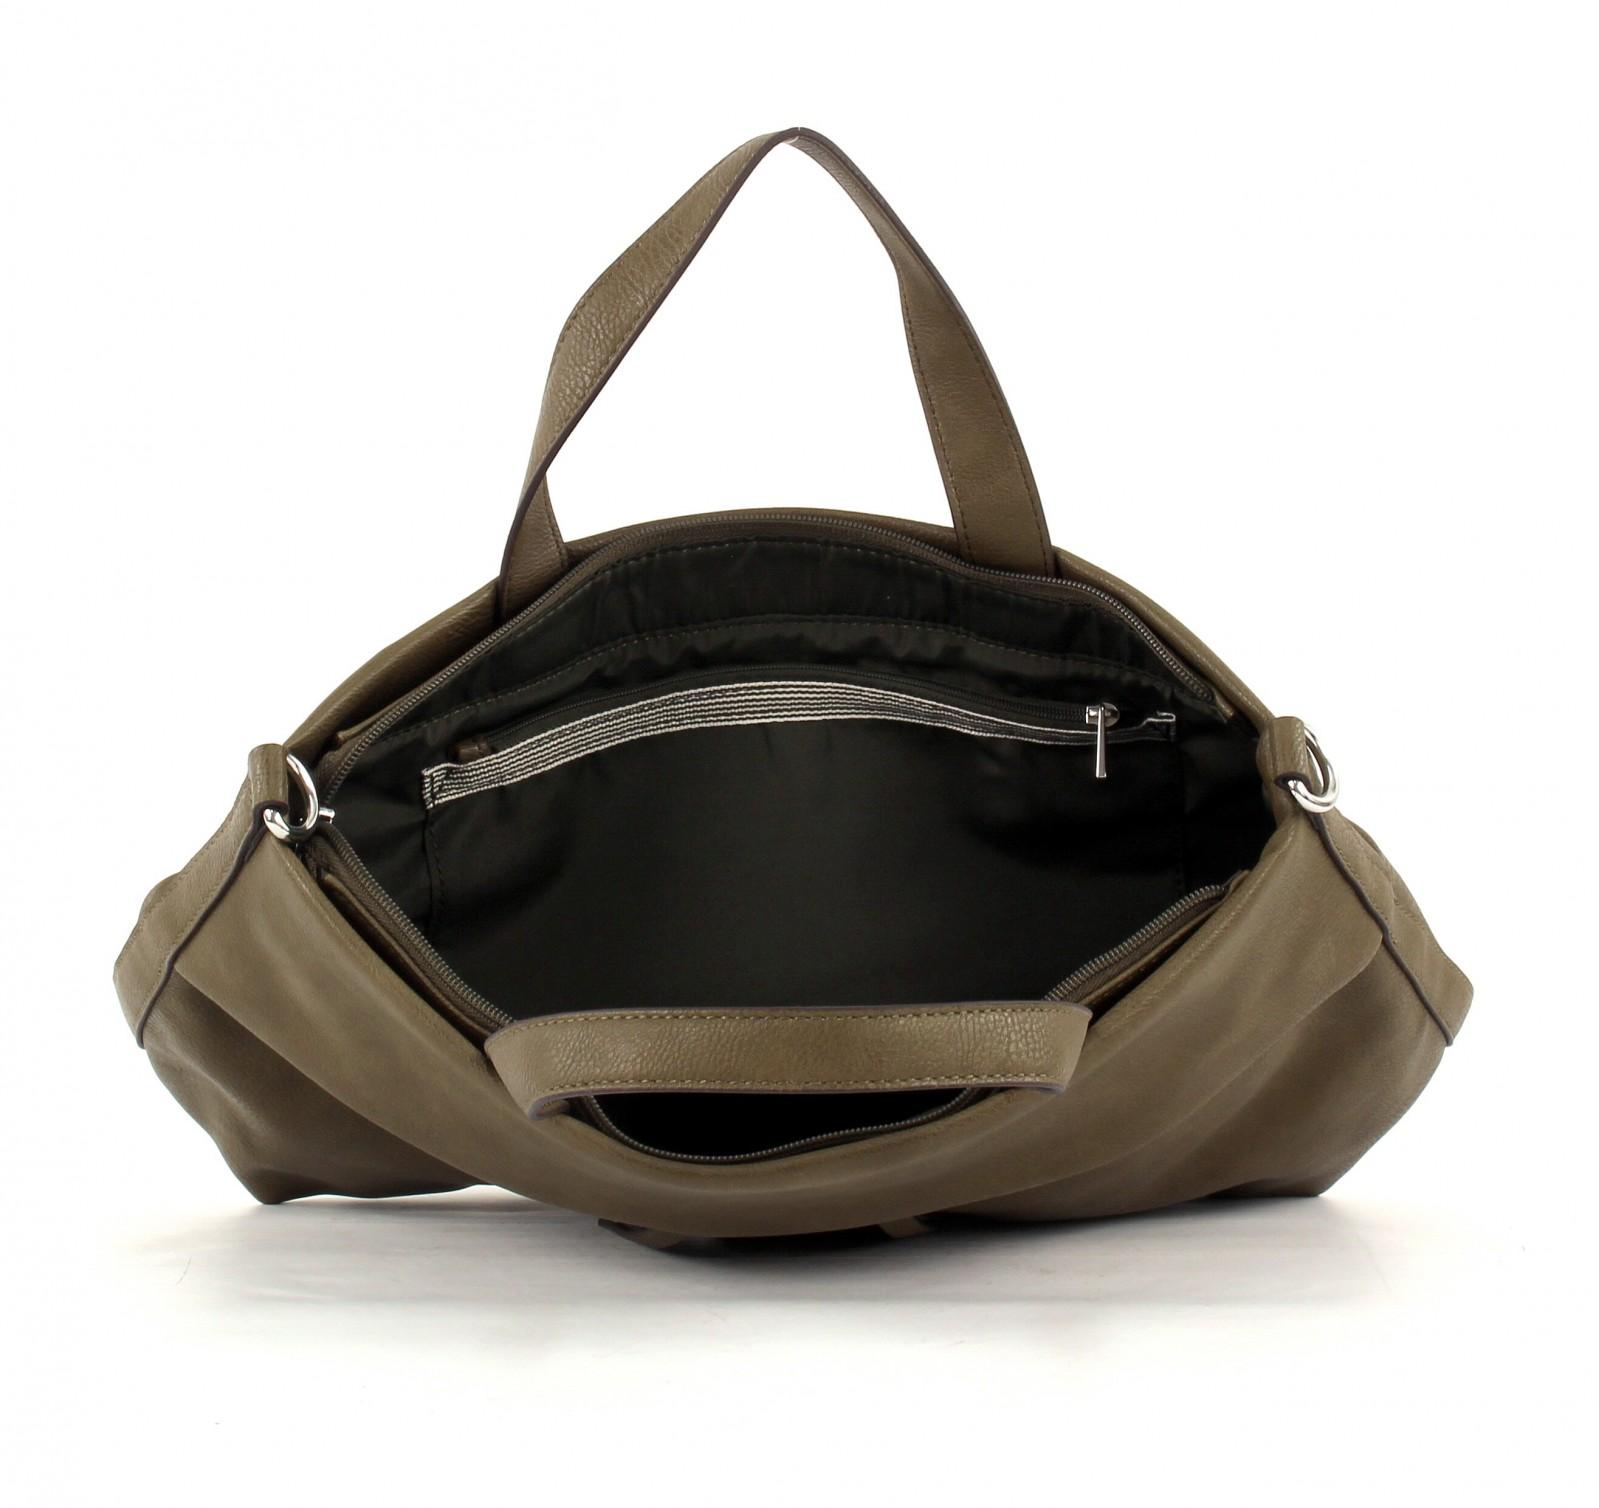 esprit fran city bag tasche handtasche umh ngetasche damen braun light khaki ebay. Black Bedroom Furniture Sets. Home Design Ideas